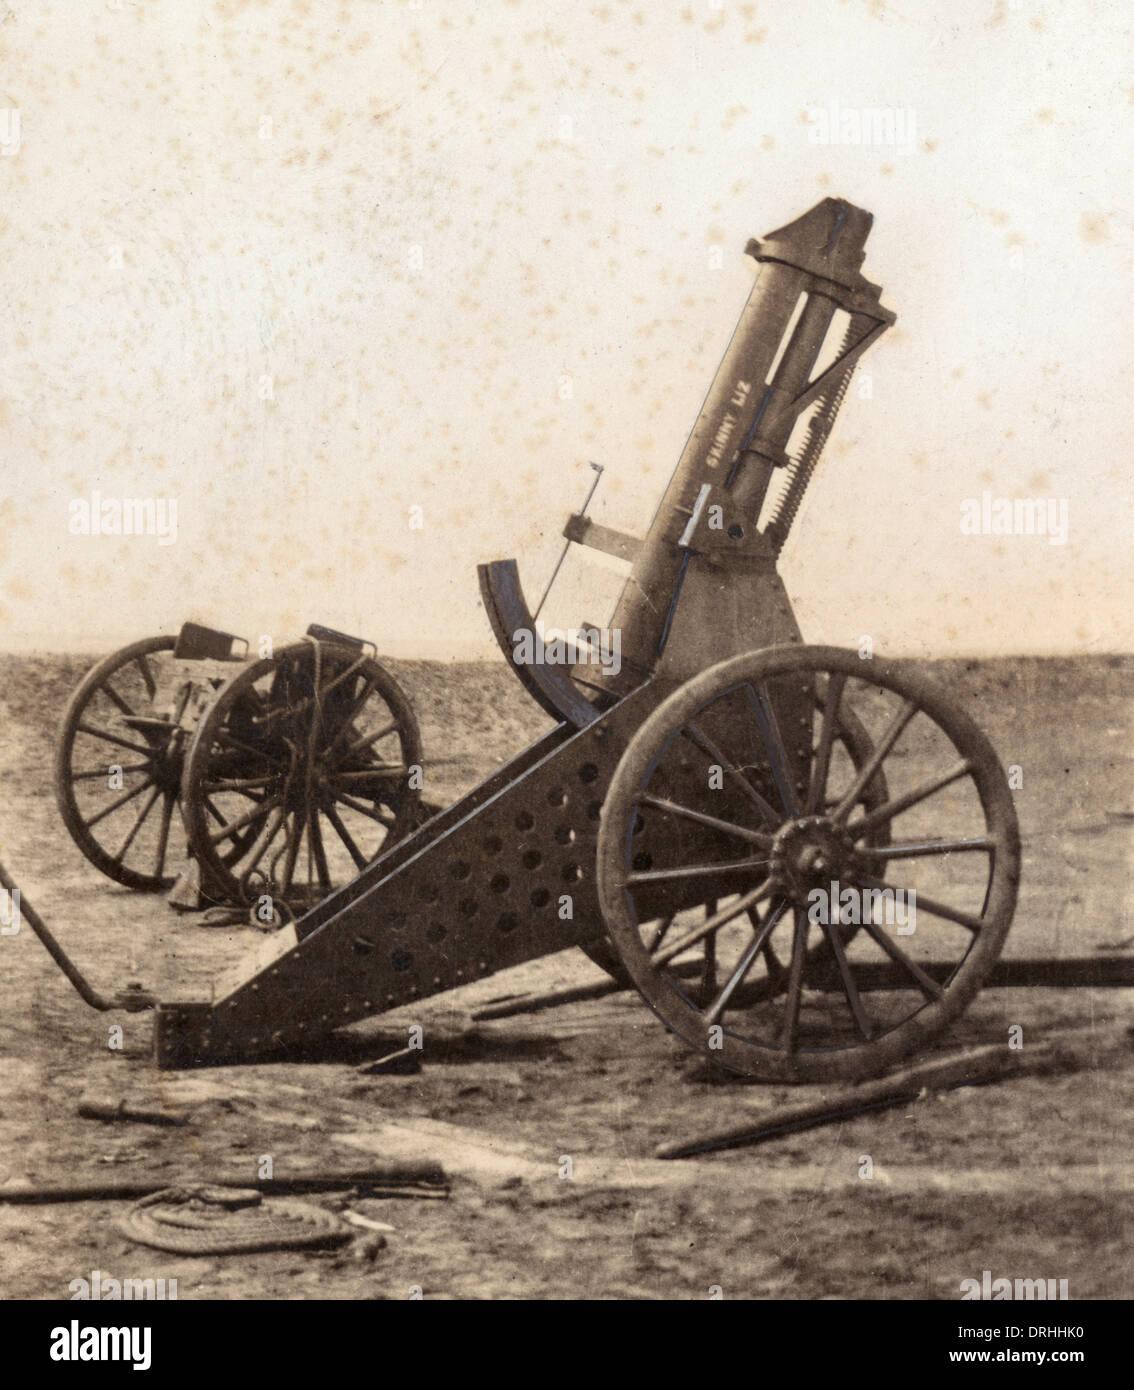 Anti-aircraft gun, Skinny Liz, Western Front, WW1 - Stock Image